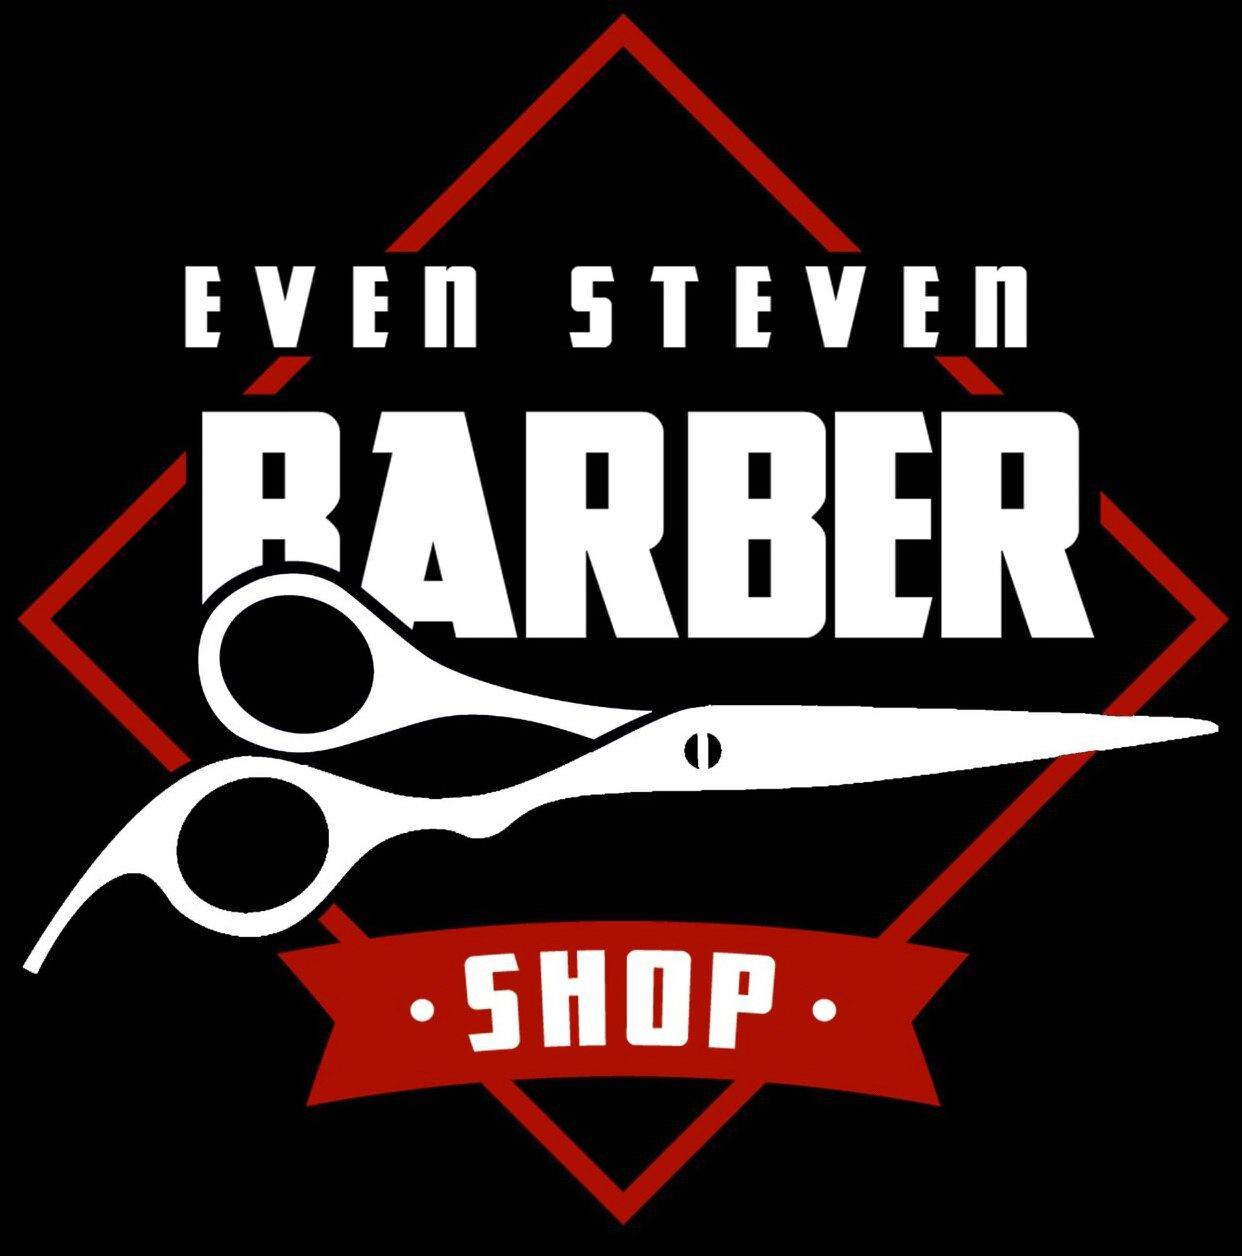 Trademark Logo EVEN STEVEN BARBER SHOP